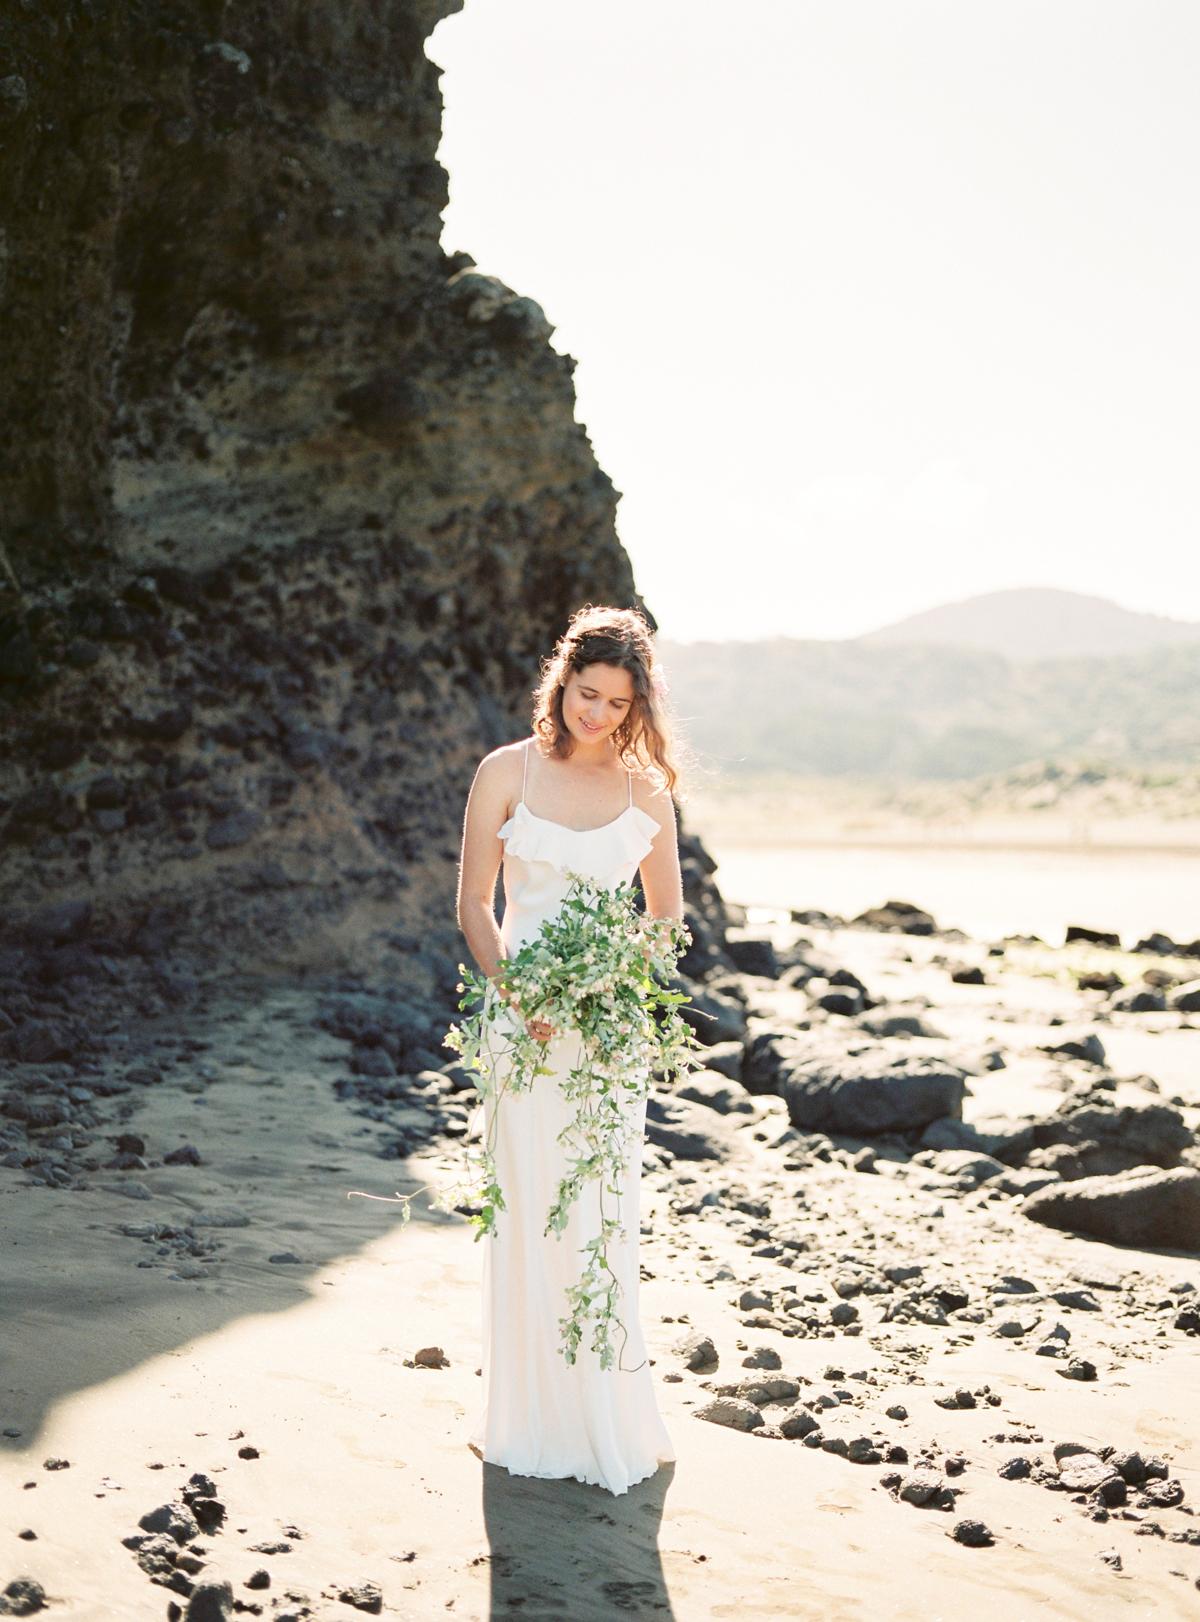 Wild wedding bouquet for beach wedding in New Zealand